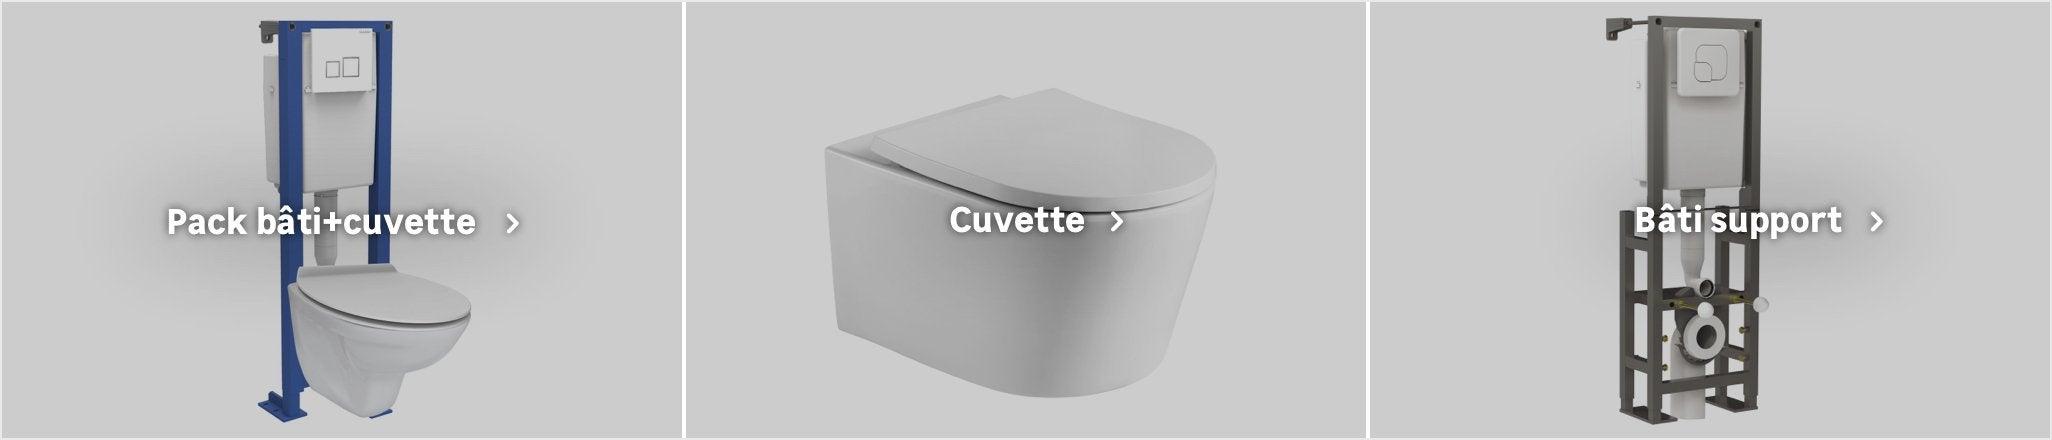 Cuvette De Wc Suspendu Geberit pack wc suspendu geberit au meilleur prix | leroy merlin